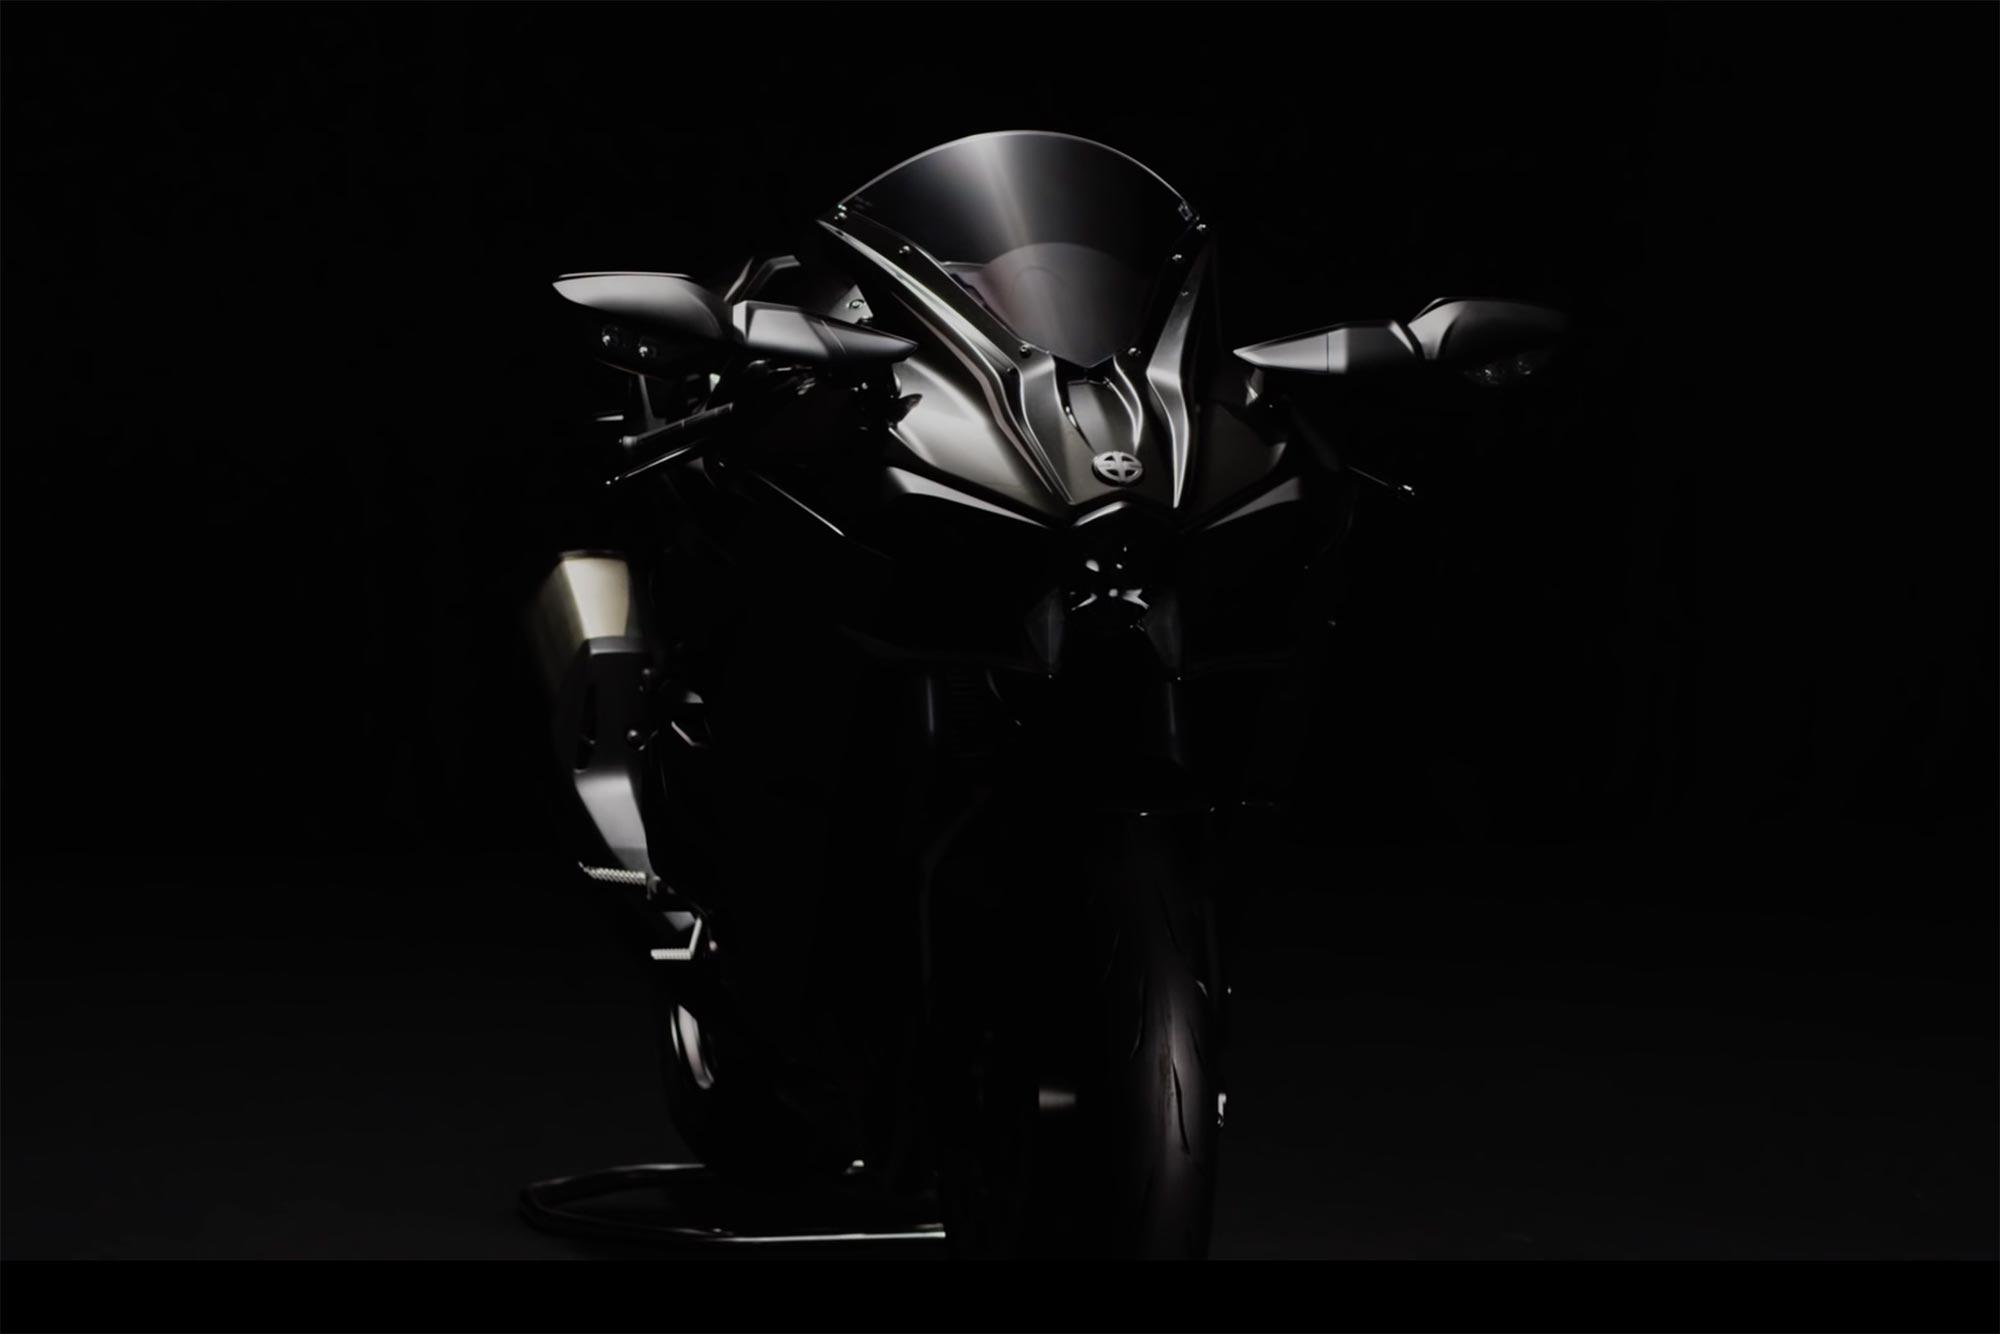 Warna Baru Kawasaki Ninja H2 Hitam Doff 2016 ini makin sadis 12 Pertamax7.com